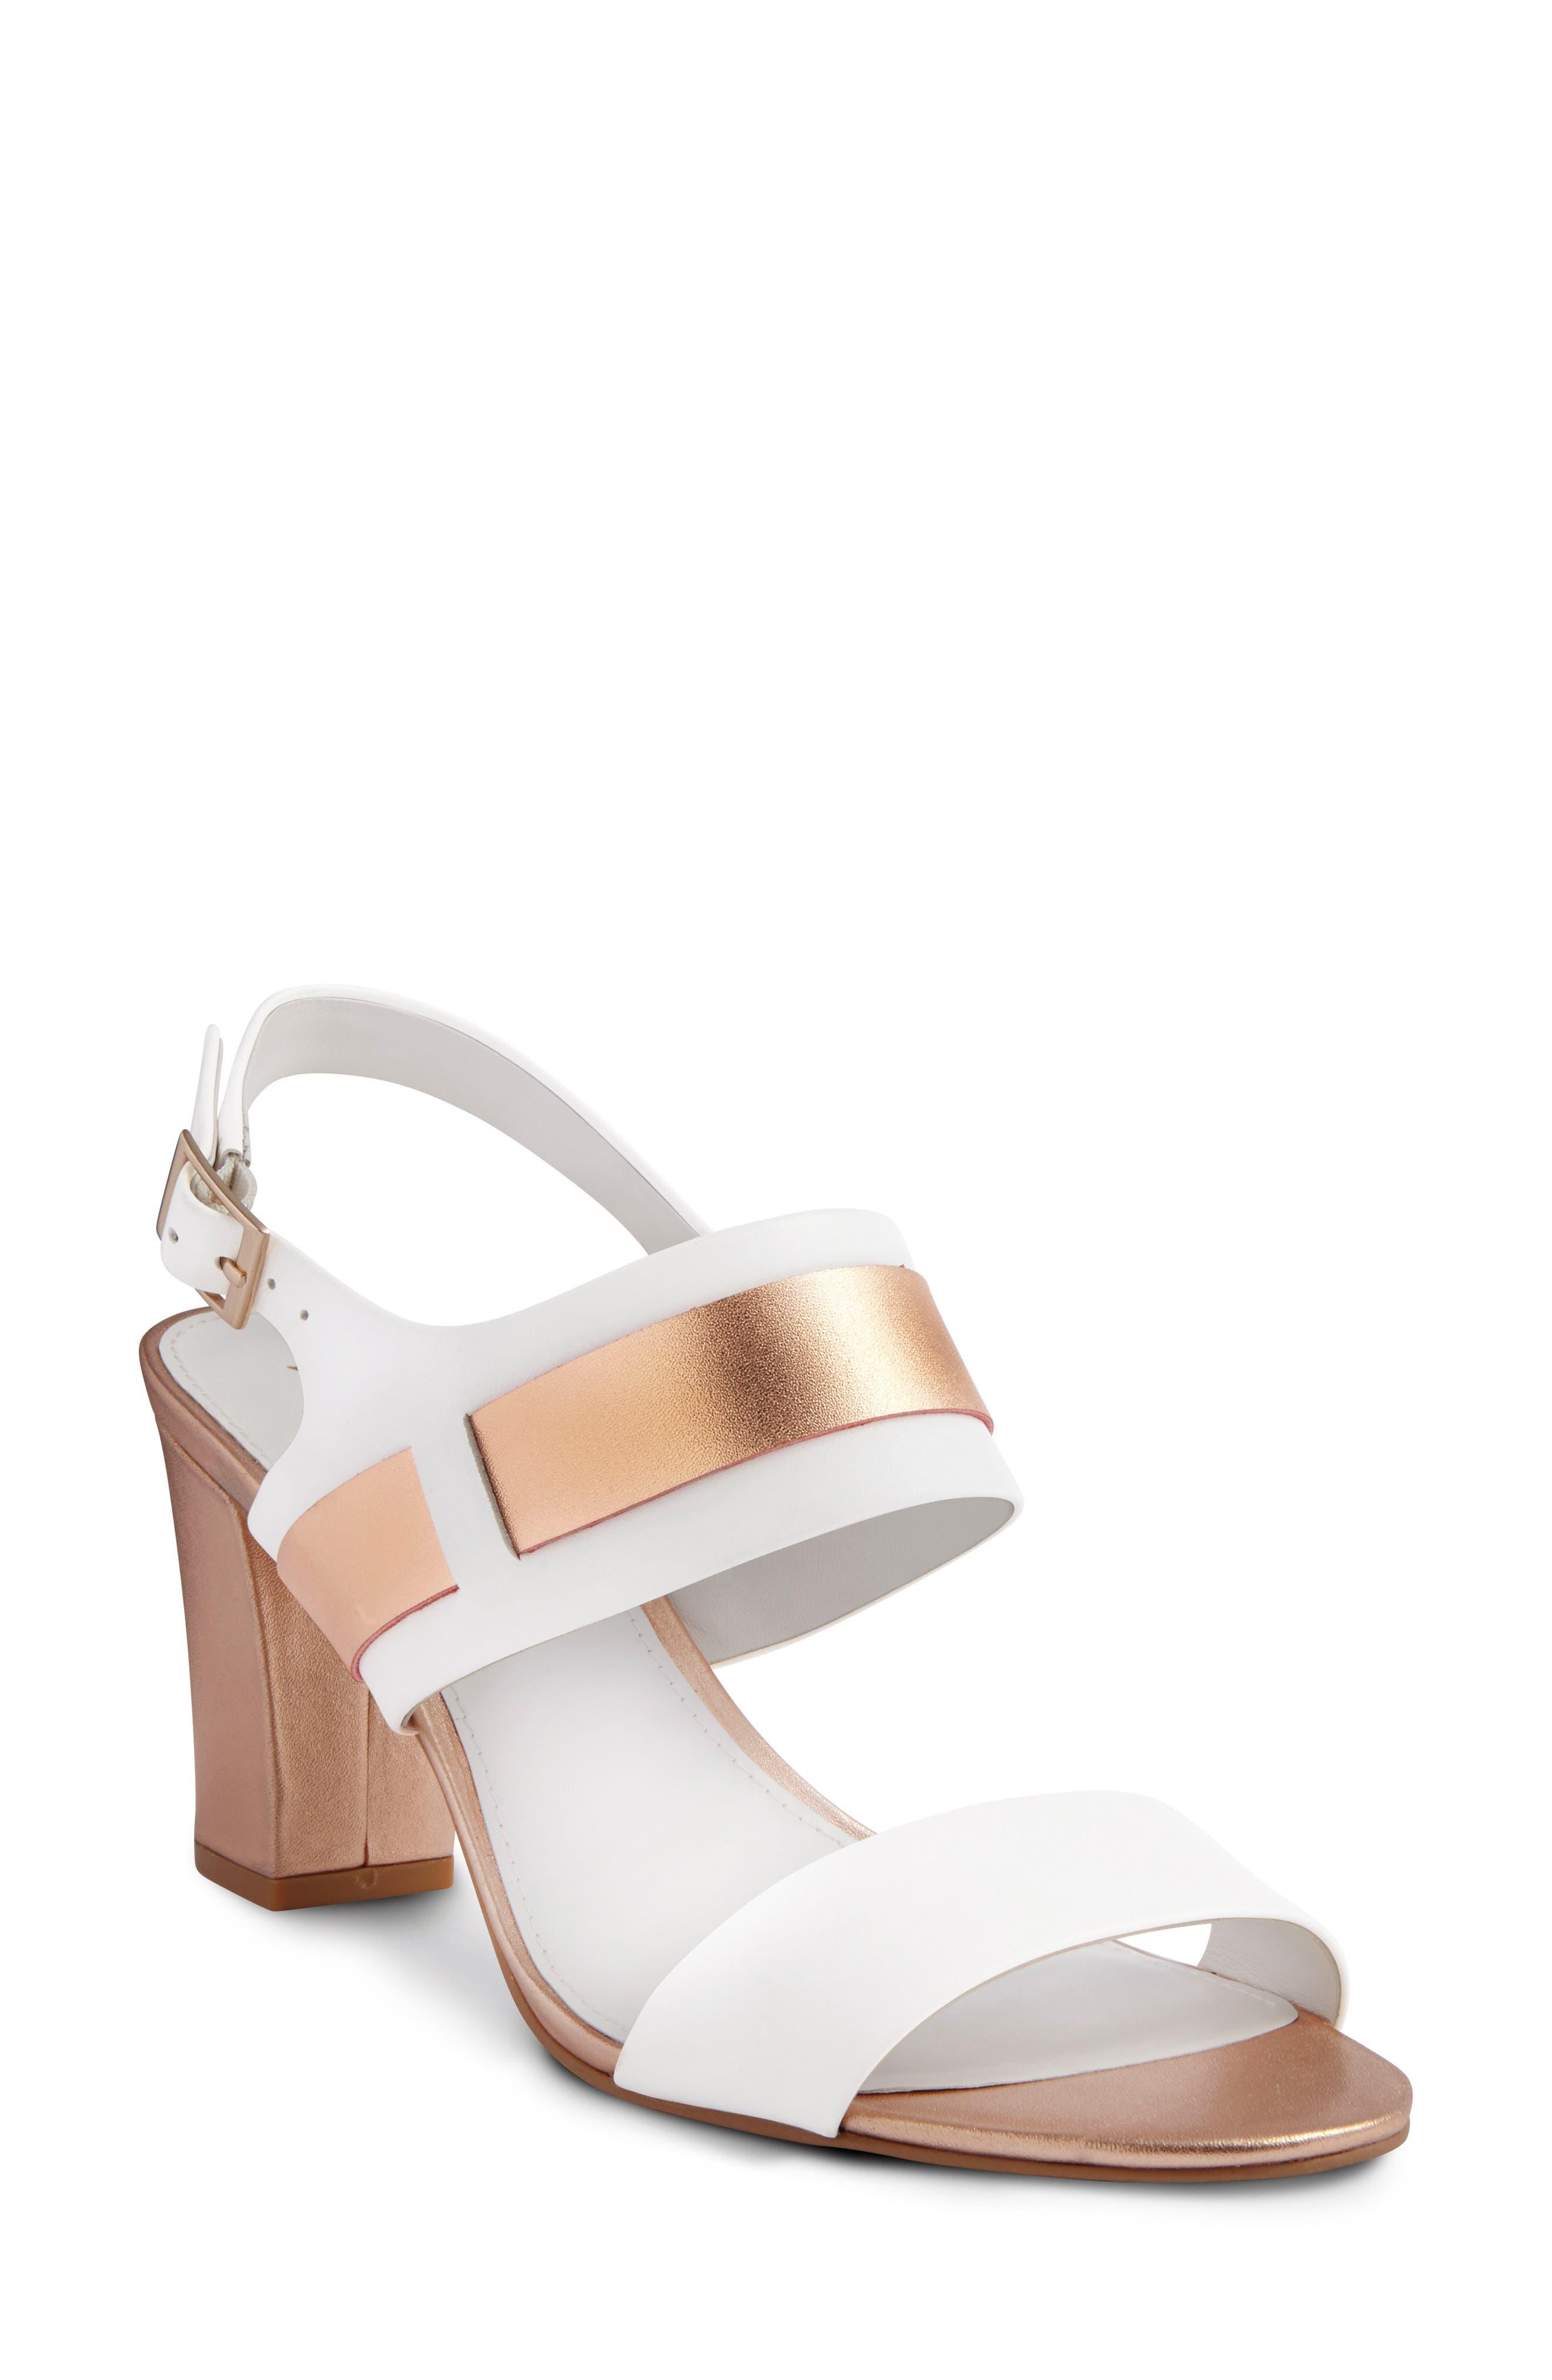 SHOES OF PREY Slingback Sandal